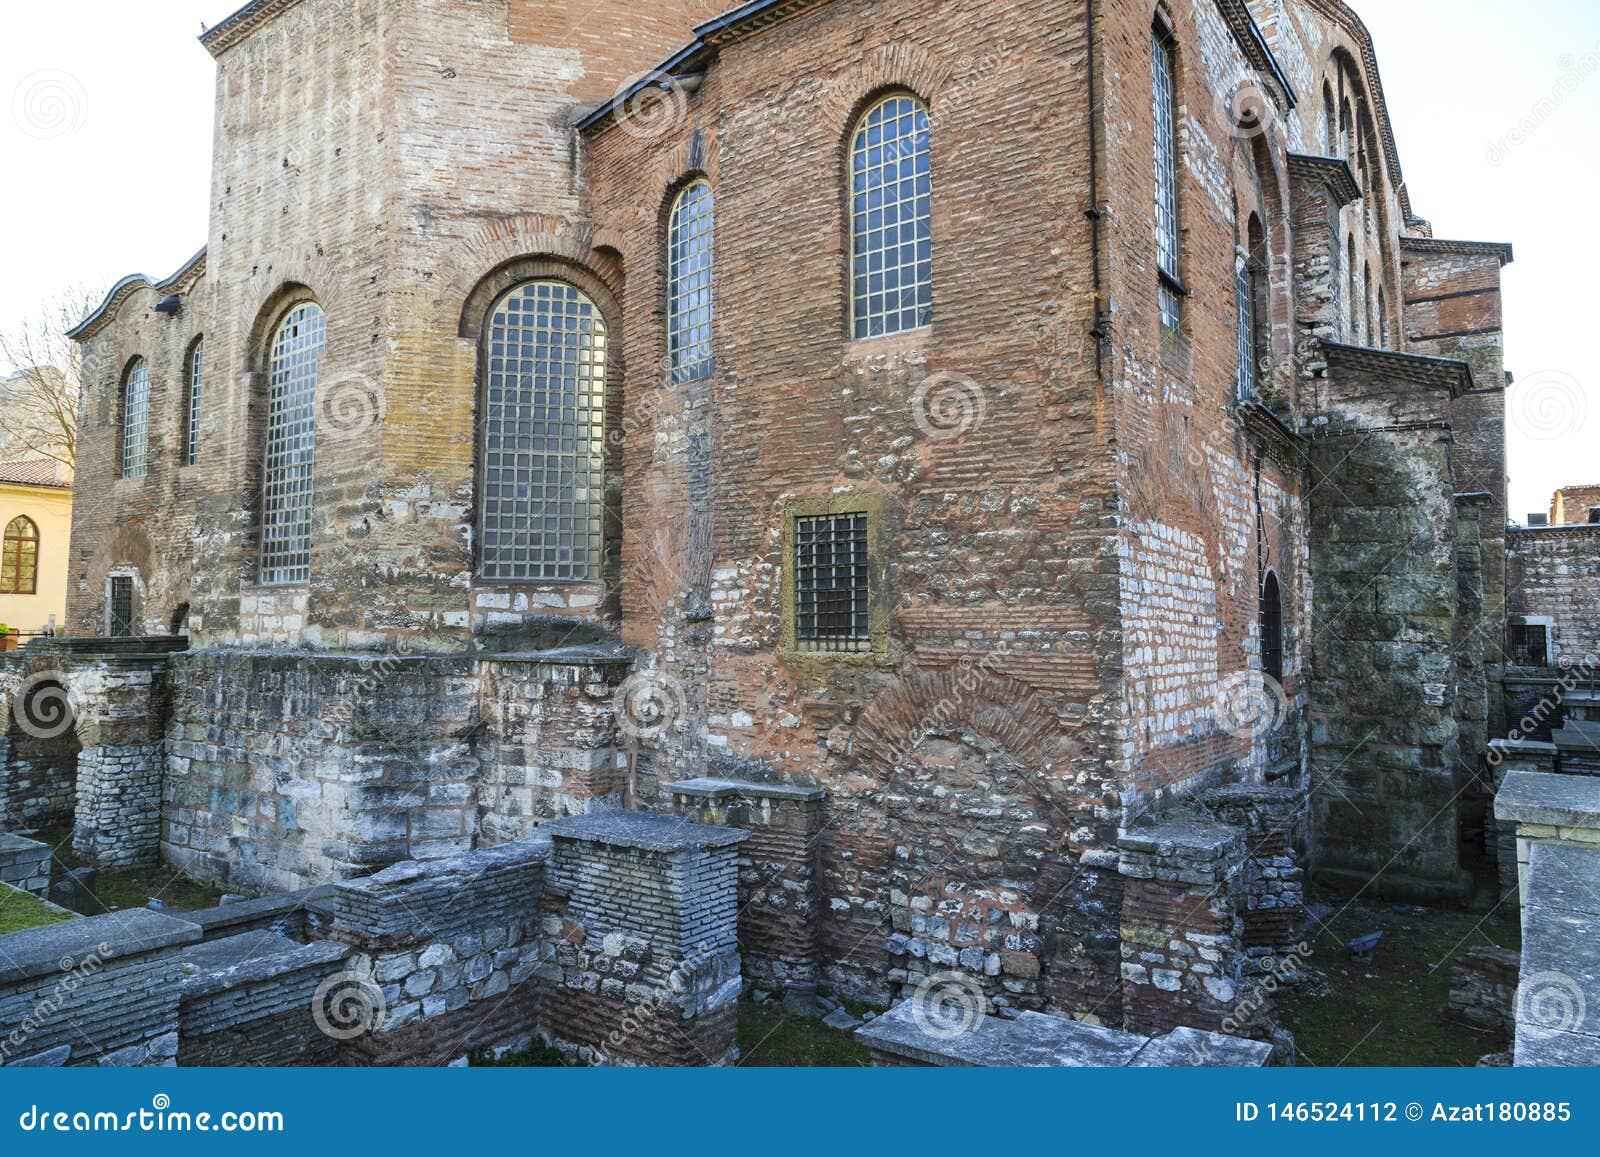 Istanbul, Turkey - 04.03.2019: Hagia Irene church Aya Irini in the park of Topkapi Palace in Istanbul, Turkey